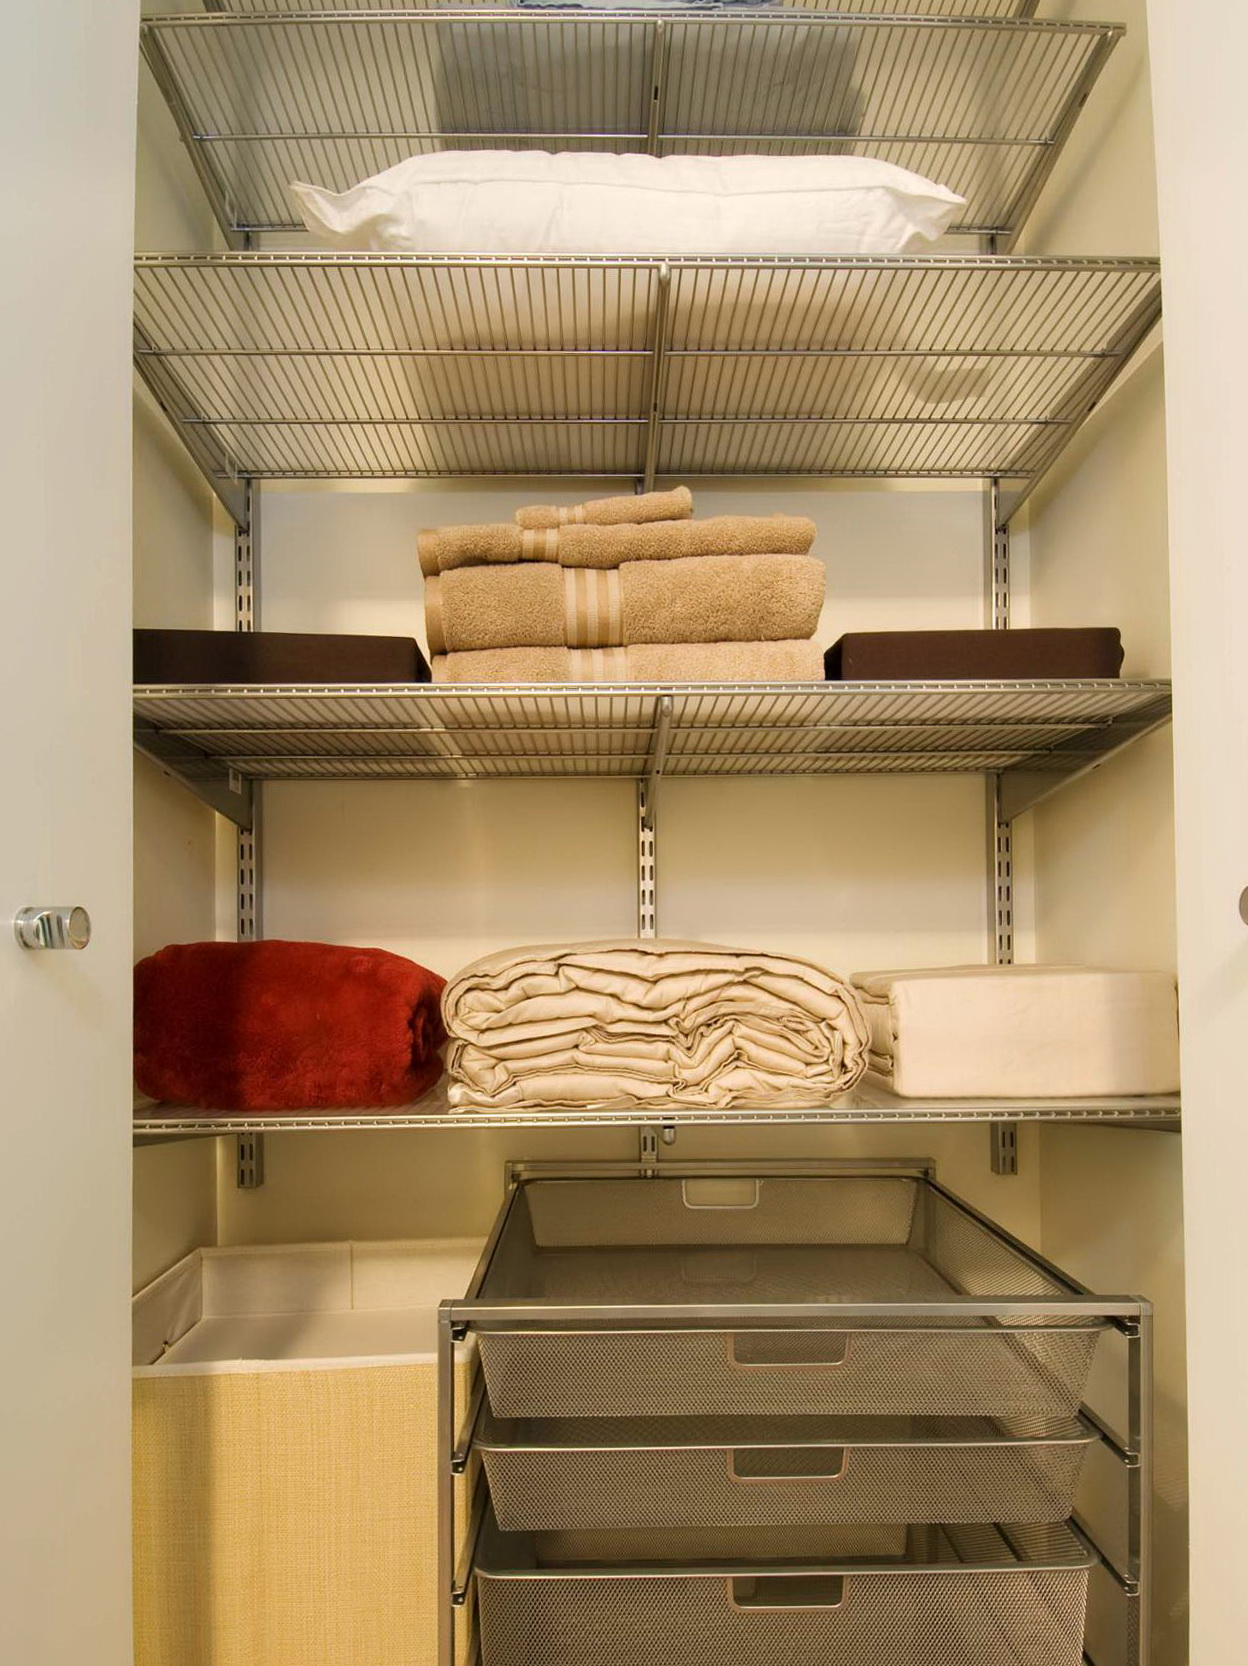 Bathroom Closet Organization Tips